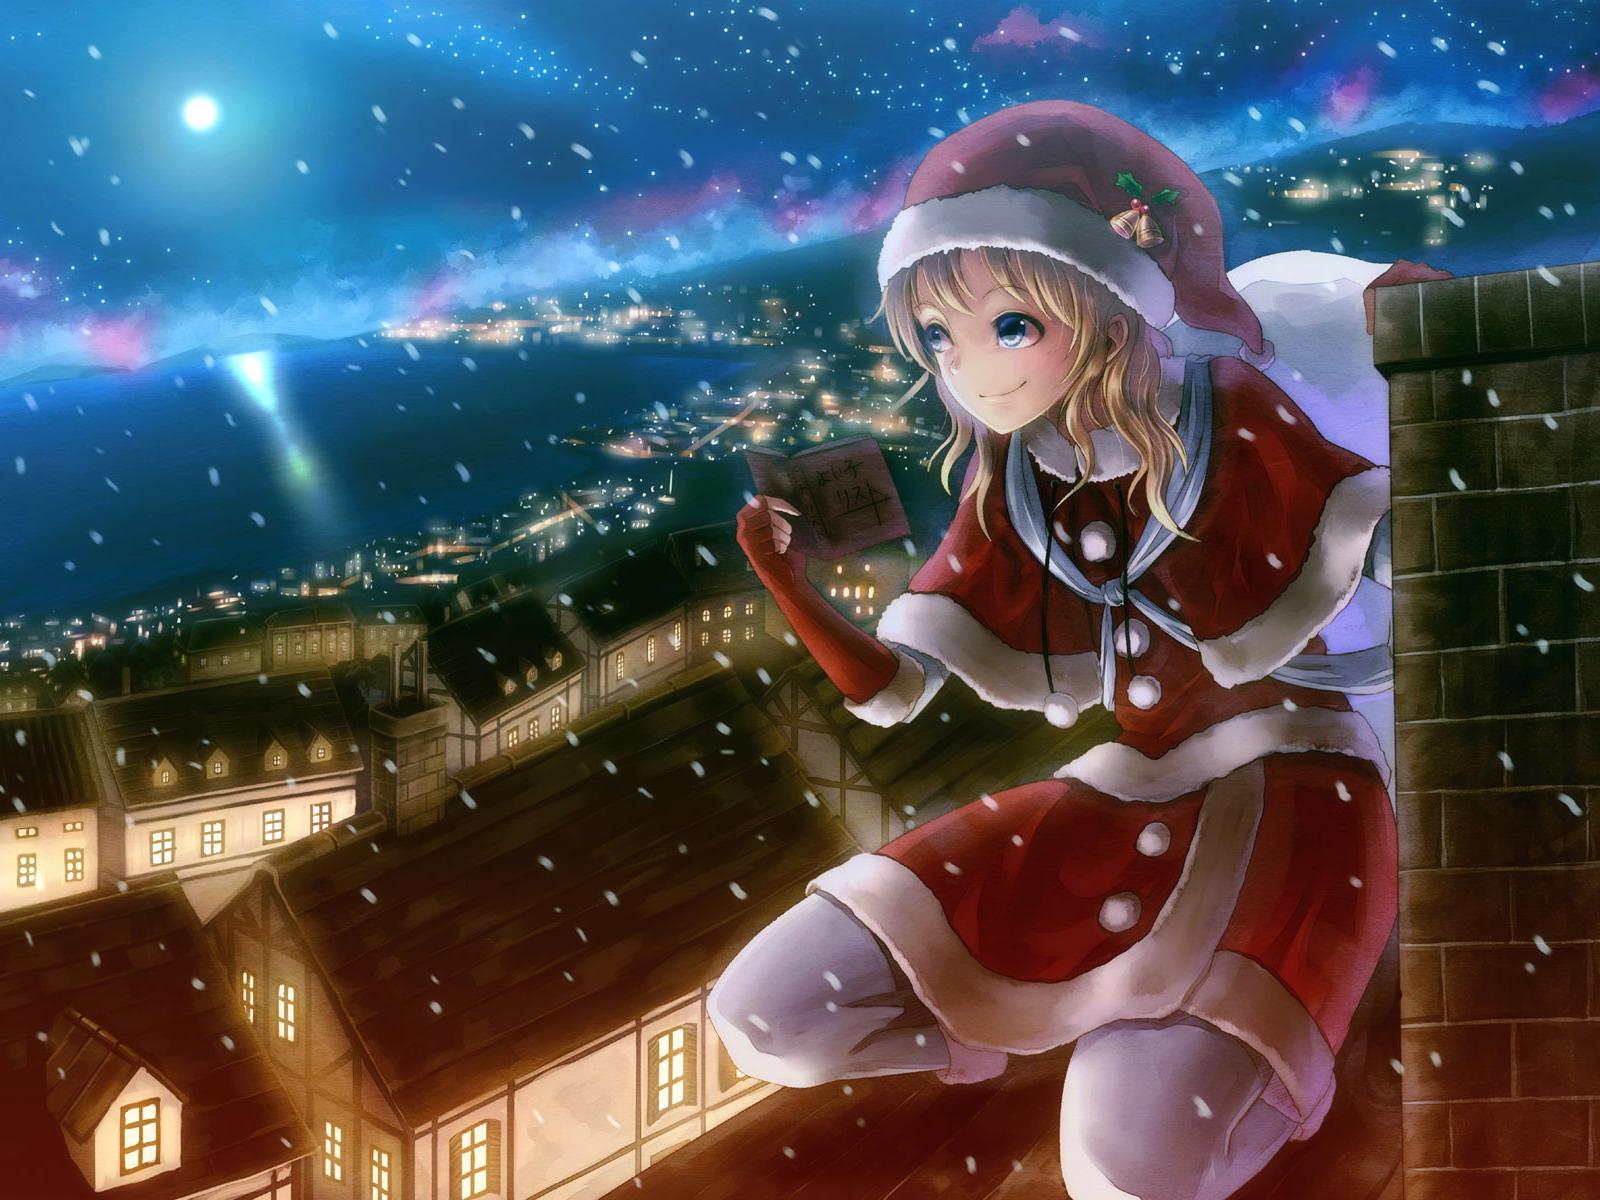 Фото девушки из аниме на новый год